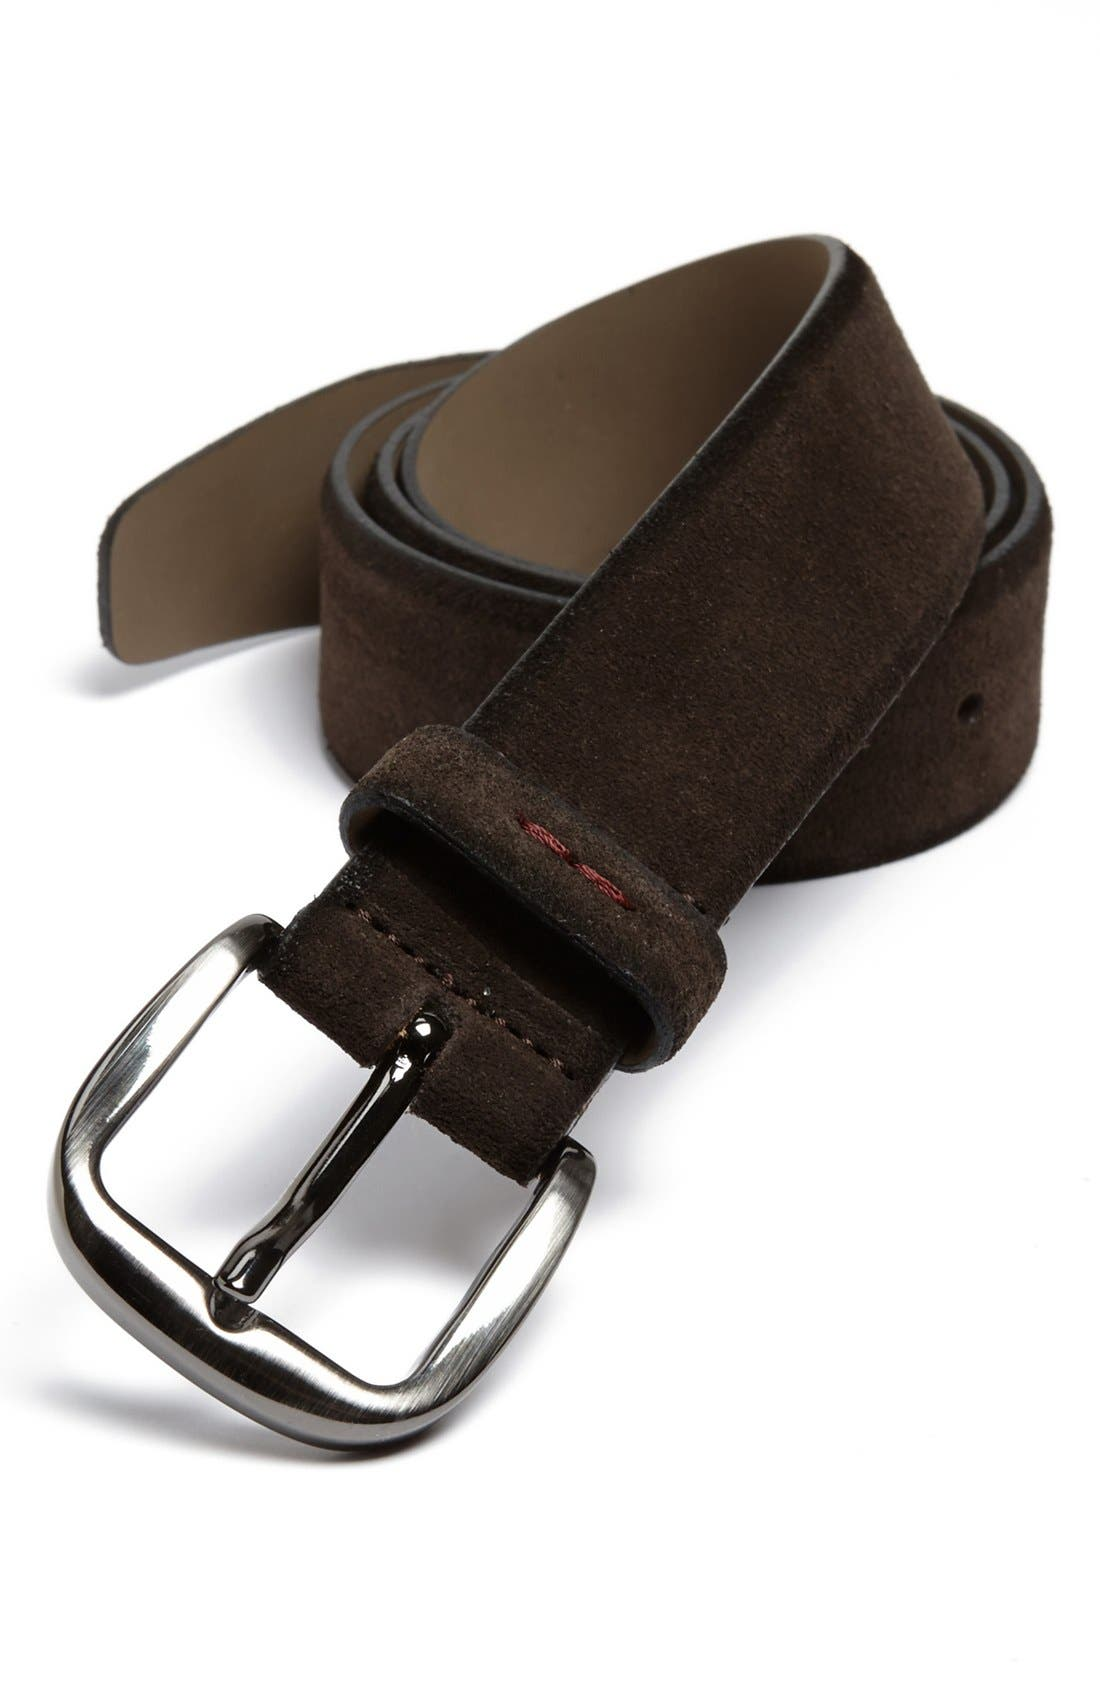 Main Image - BOSS HUGO BOSS 'Caros-S' Belt